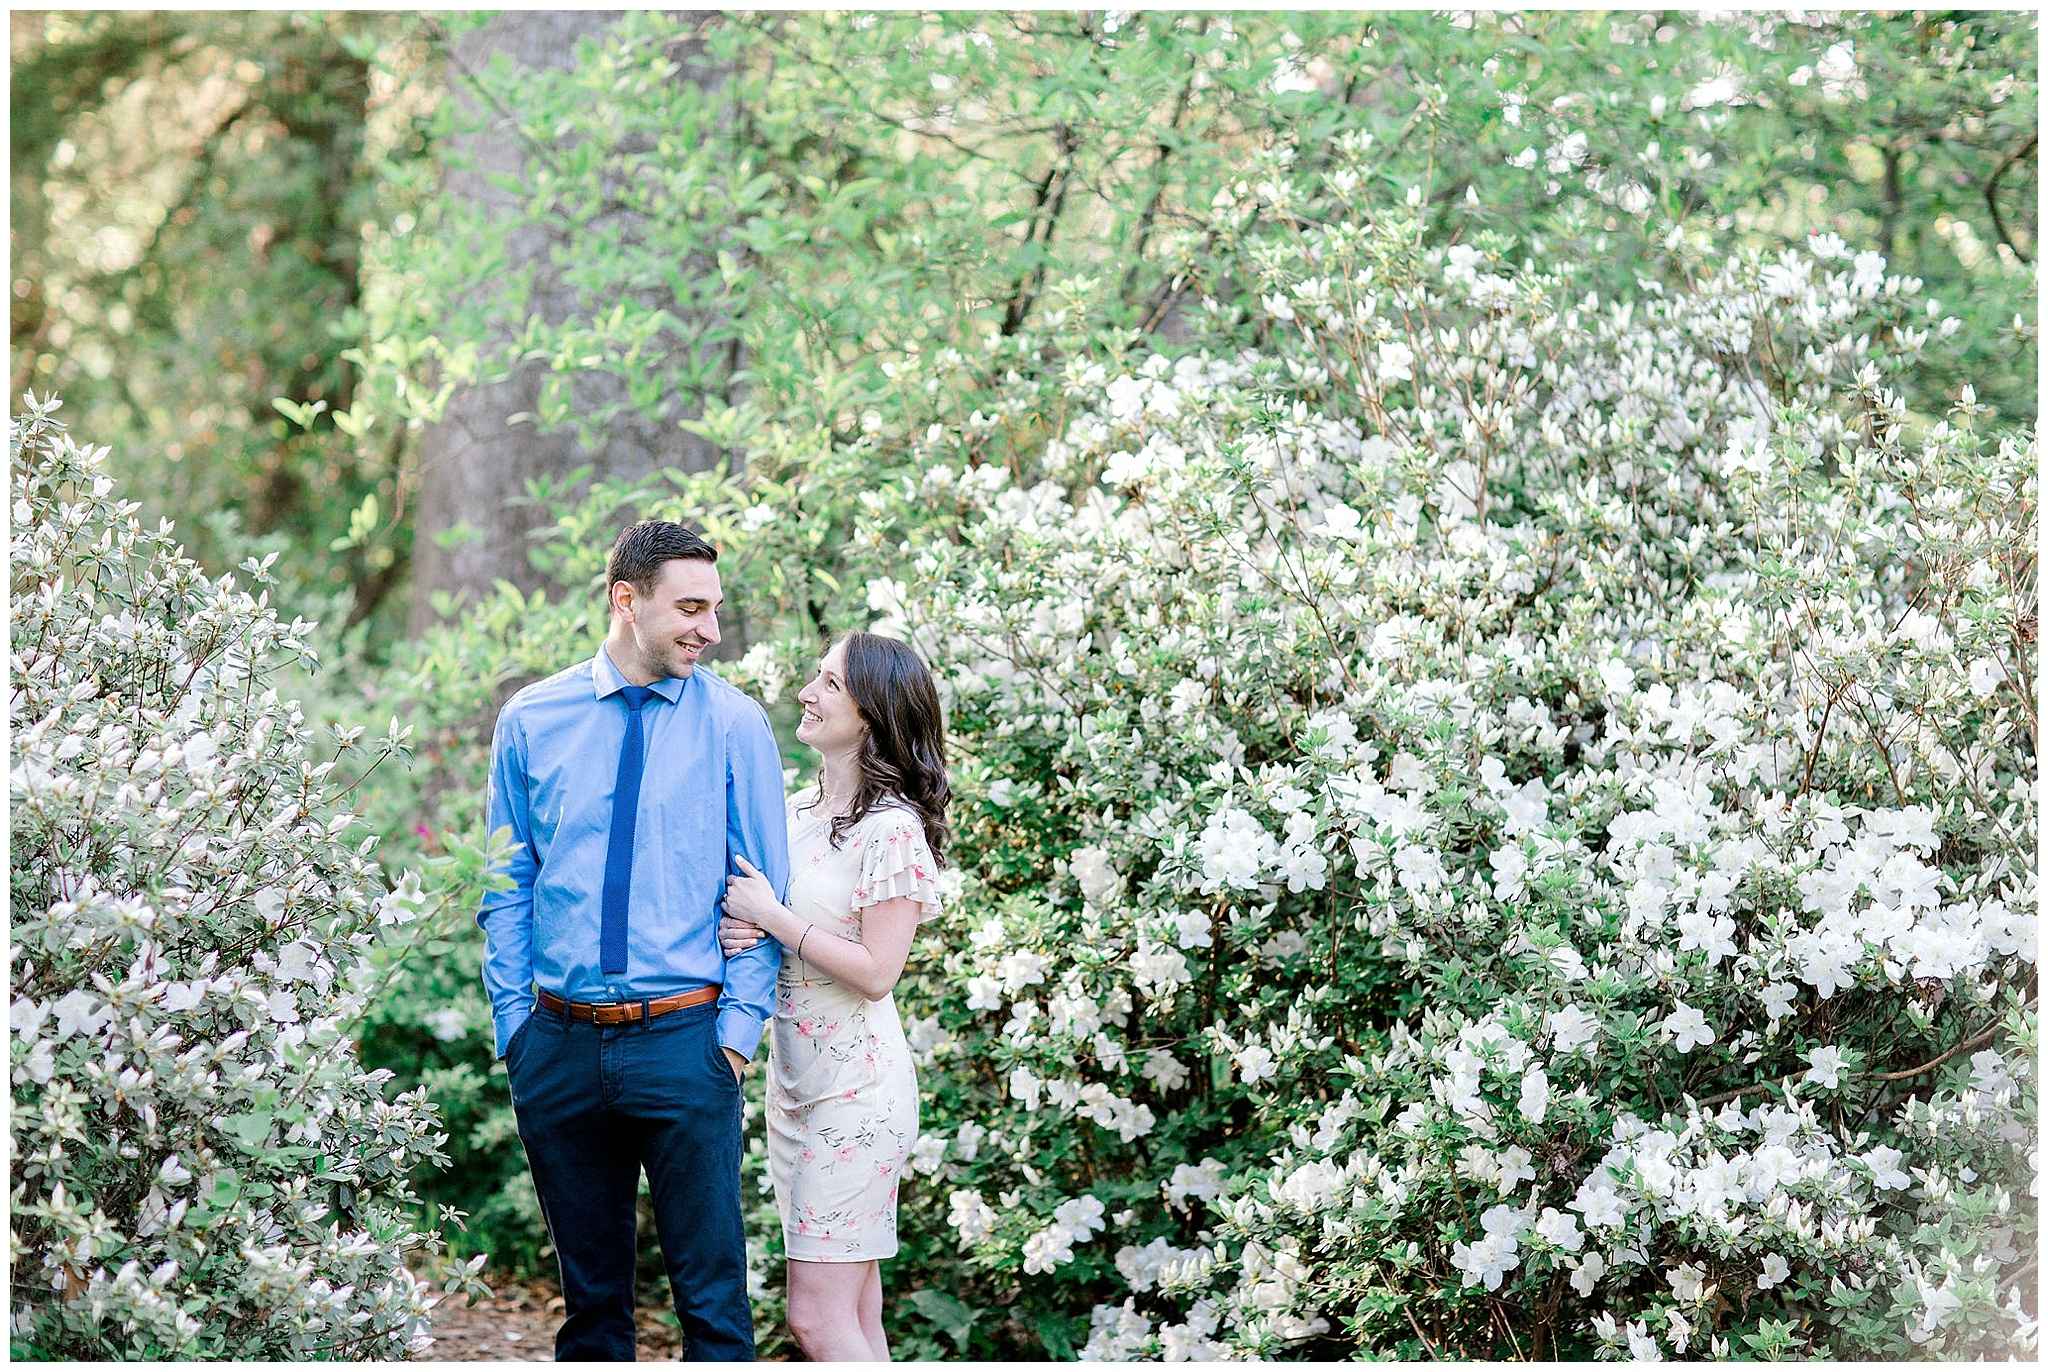 bethesda wedding photographer, maryland wedding photographer, arlington va wedding photographer, dc wedding photographer, garden engagement photos